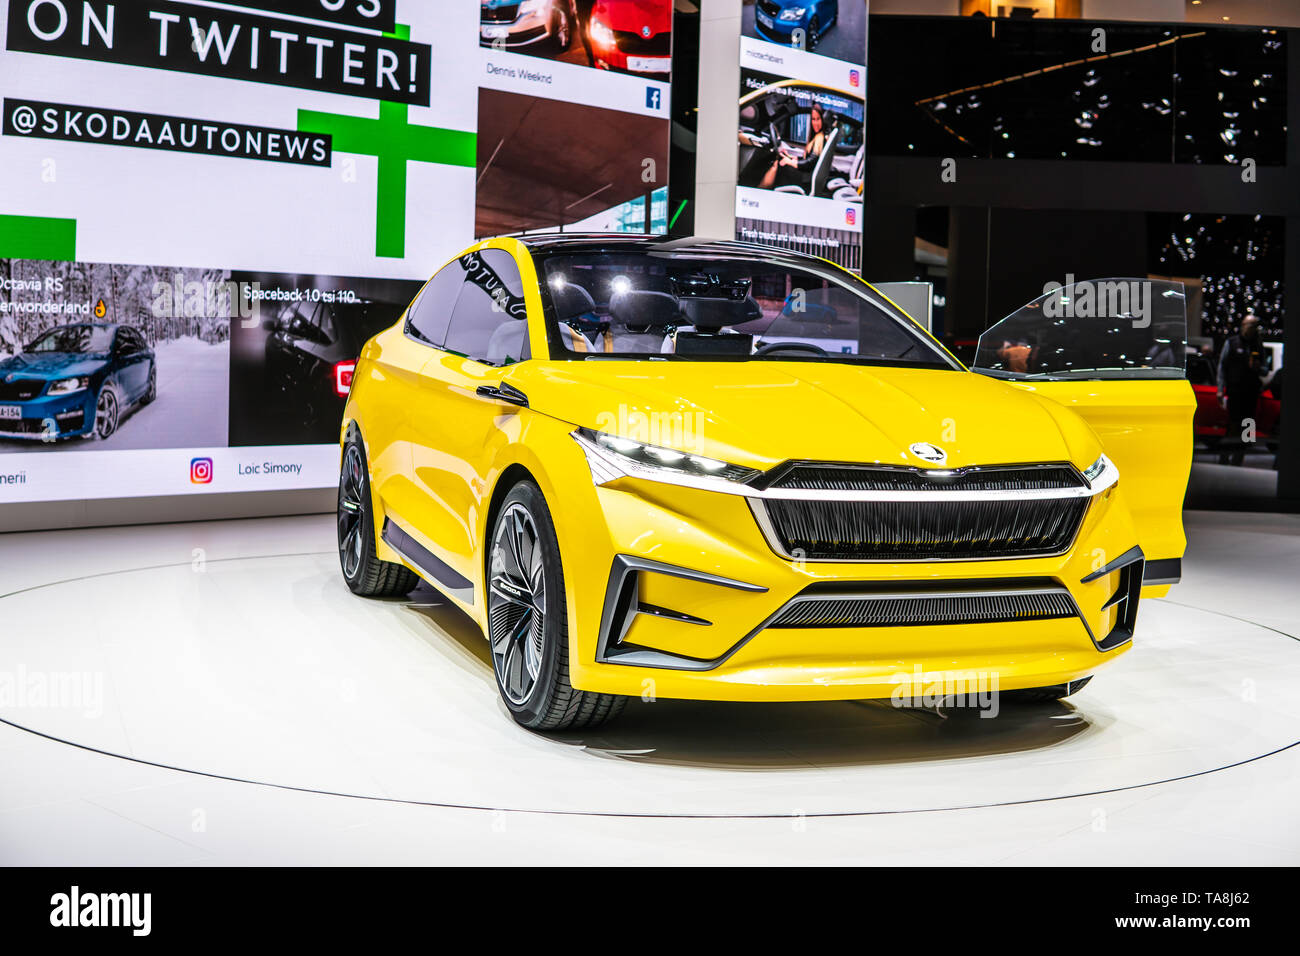 Geneva, Switzerland, March 07, 2019: Skoda VISION iV prototype at Geneva International Motor Show purely electrically driven concept car from Skoda - Stock Image